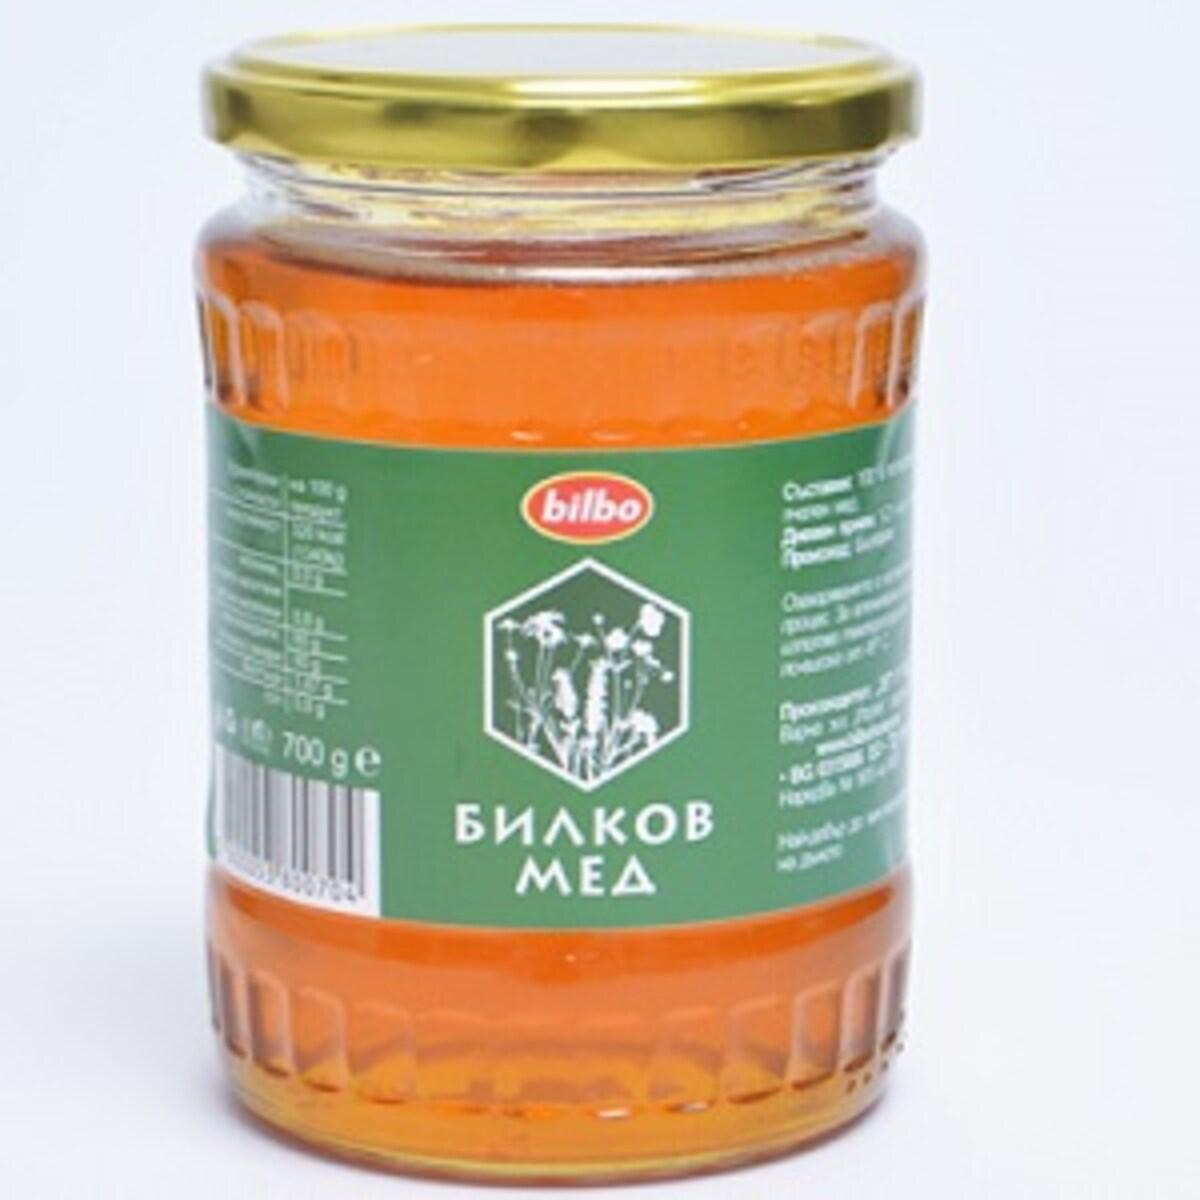 Bilbo Билков мед, 700гр